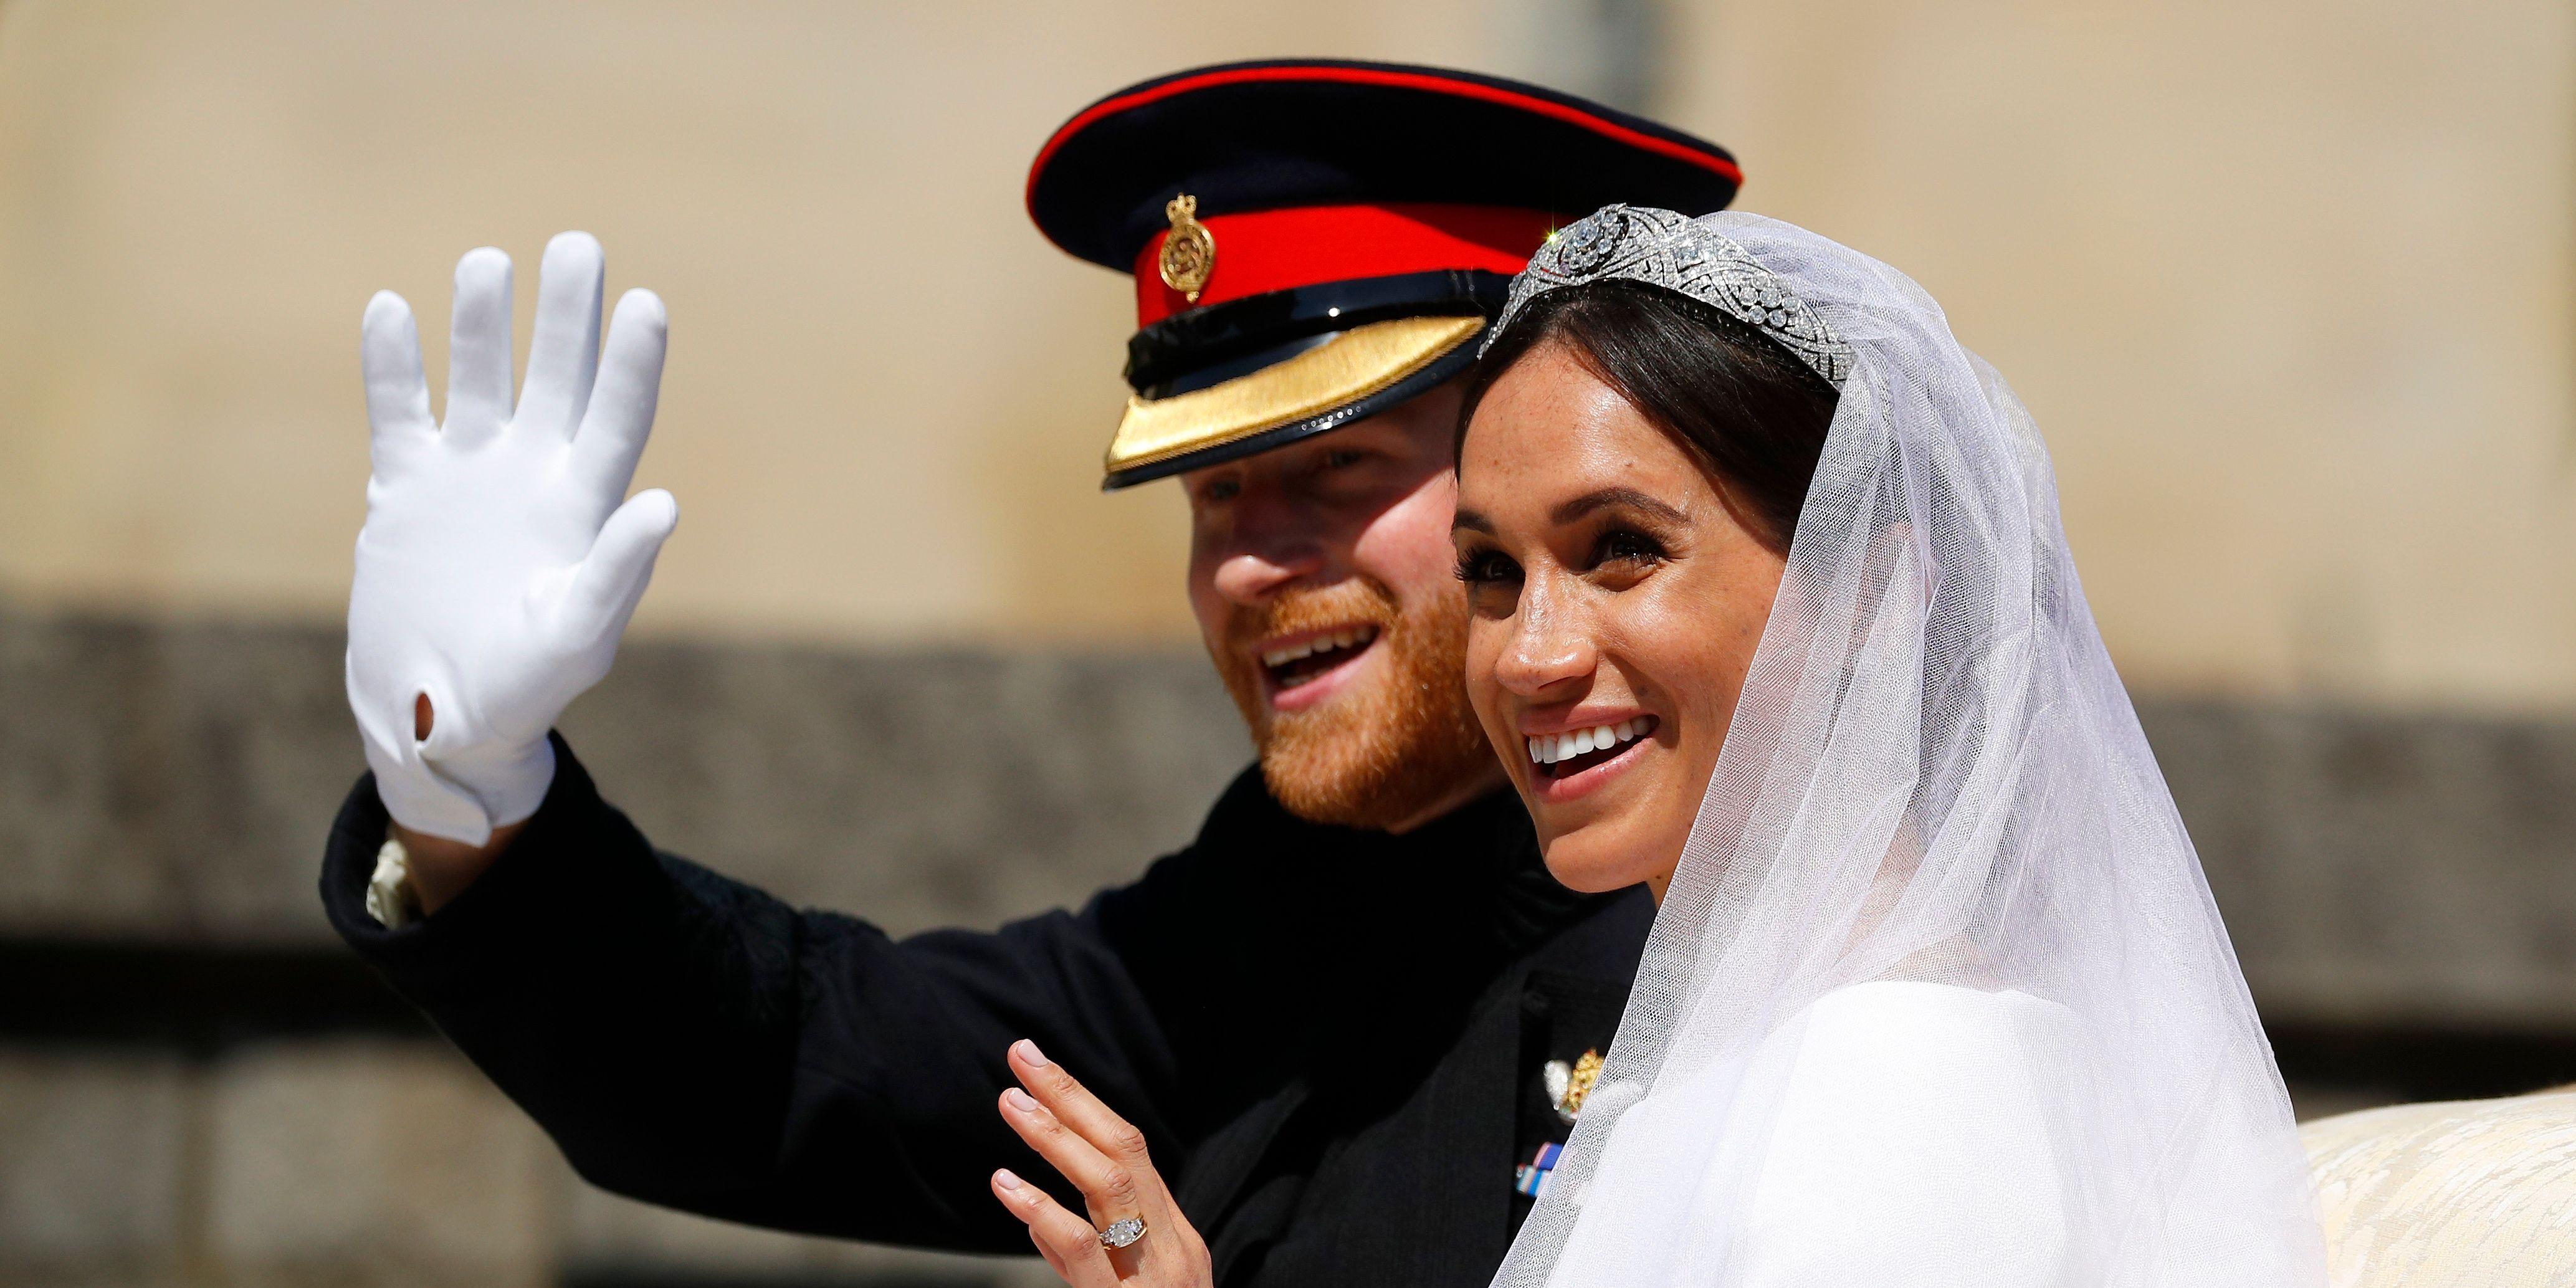 royal-wedding-meghan-markle